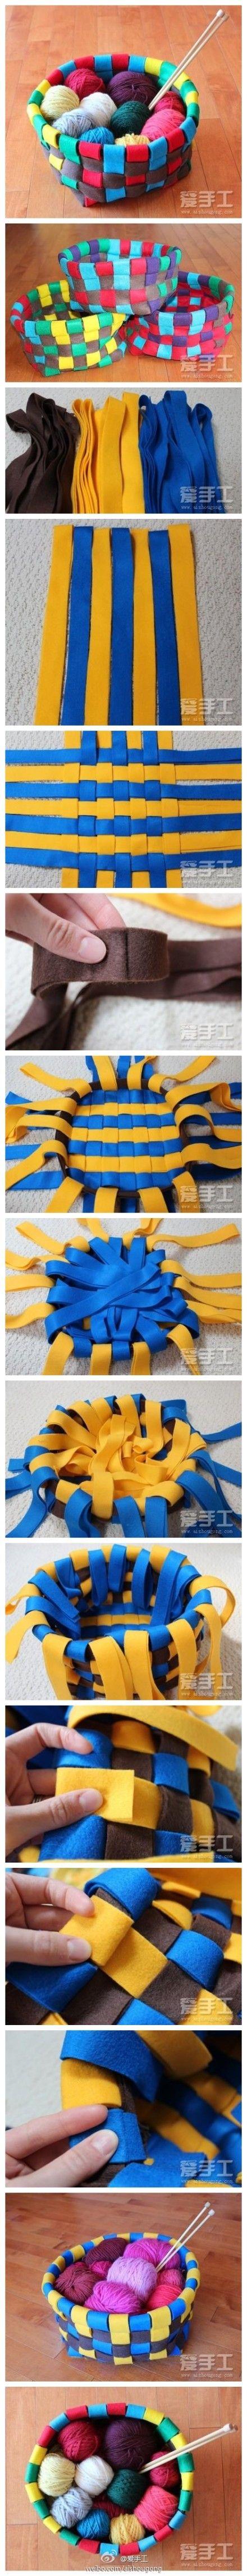 Cloth Basket DIY Projects | UsefulDIY.com